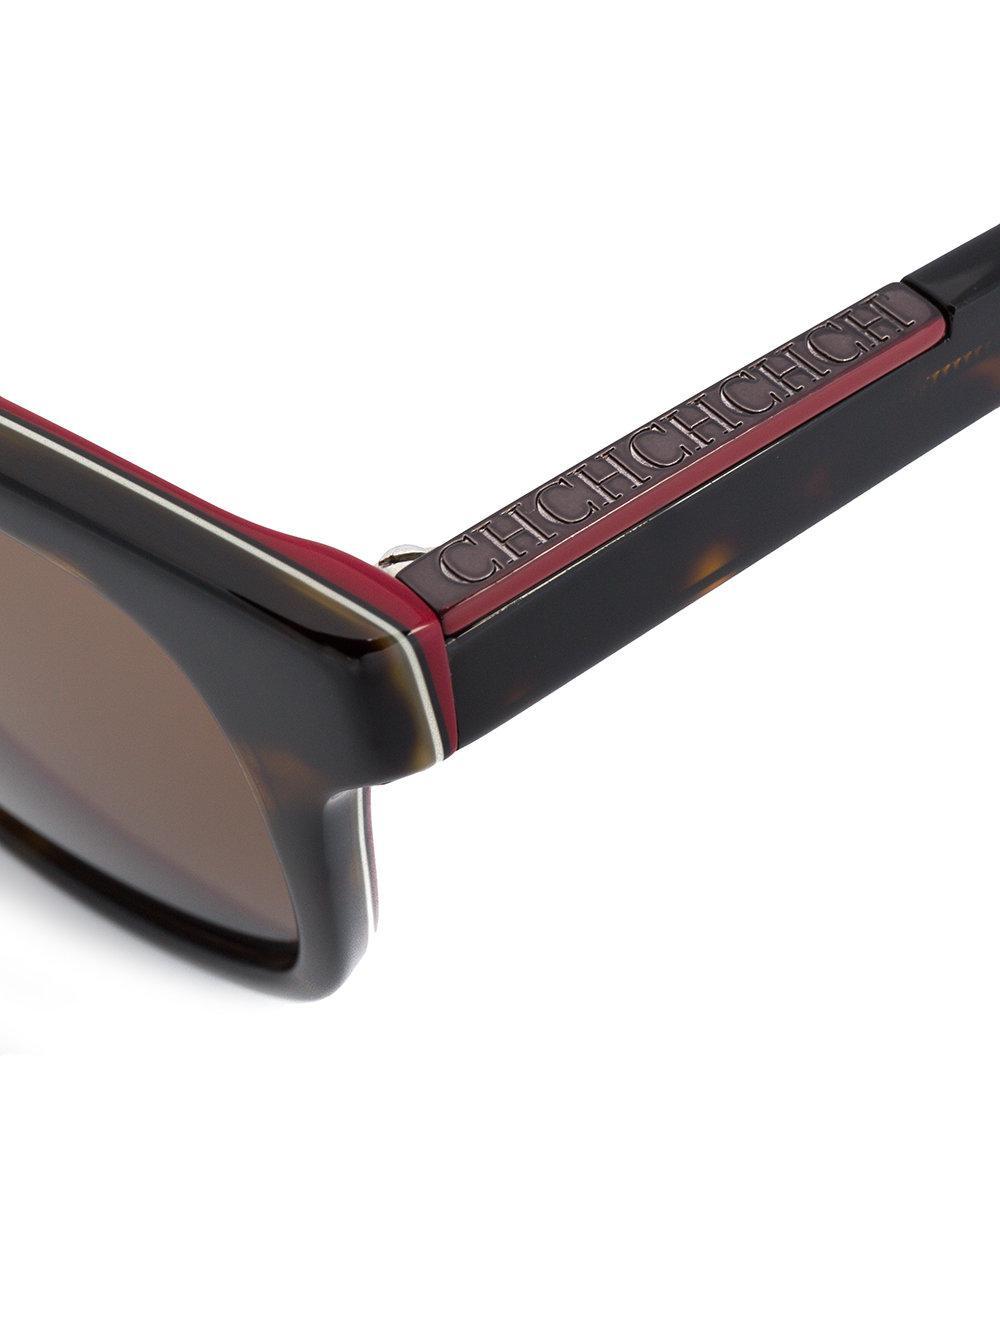 CH by Carolina Herrera She685 Sunglasses in Black